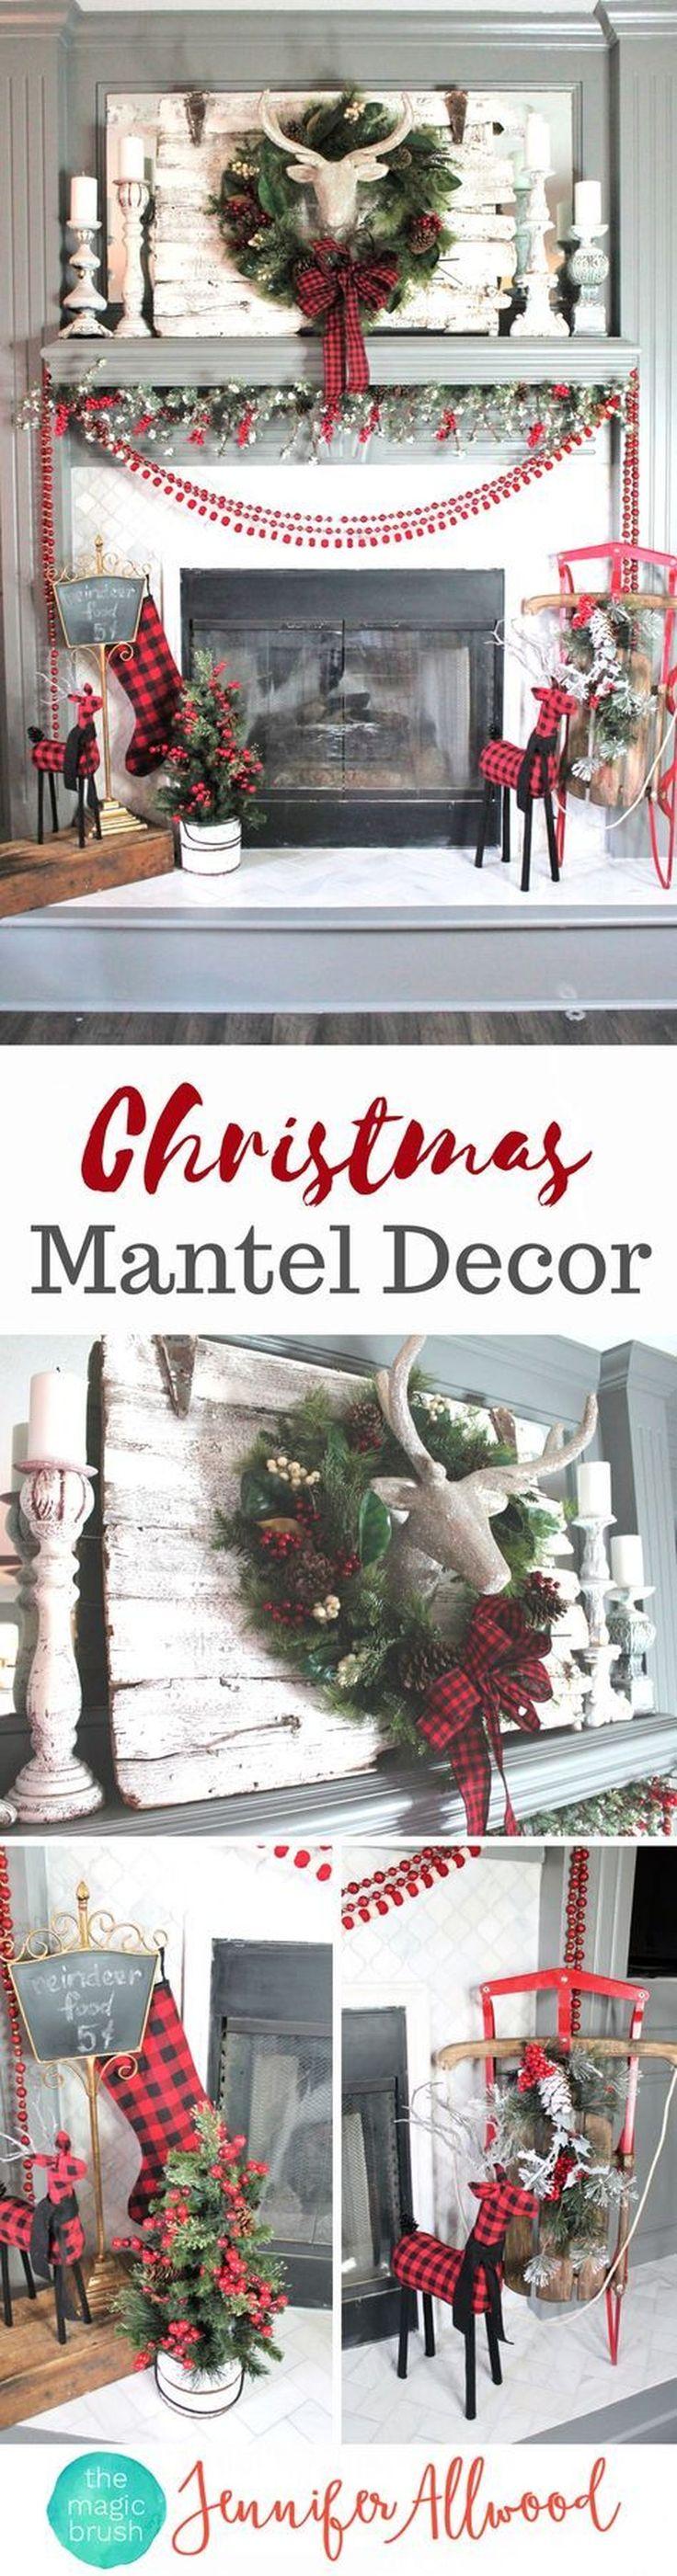 1877 best Love Christmas Creating Memories images on Pinterest